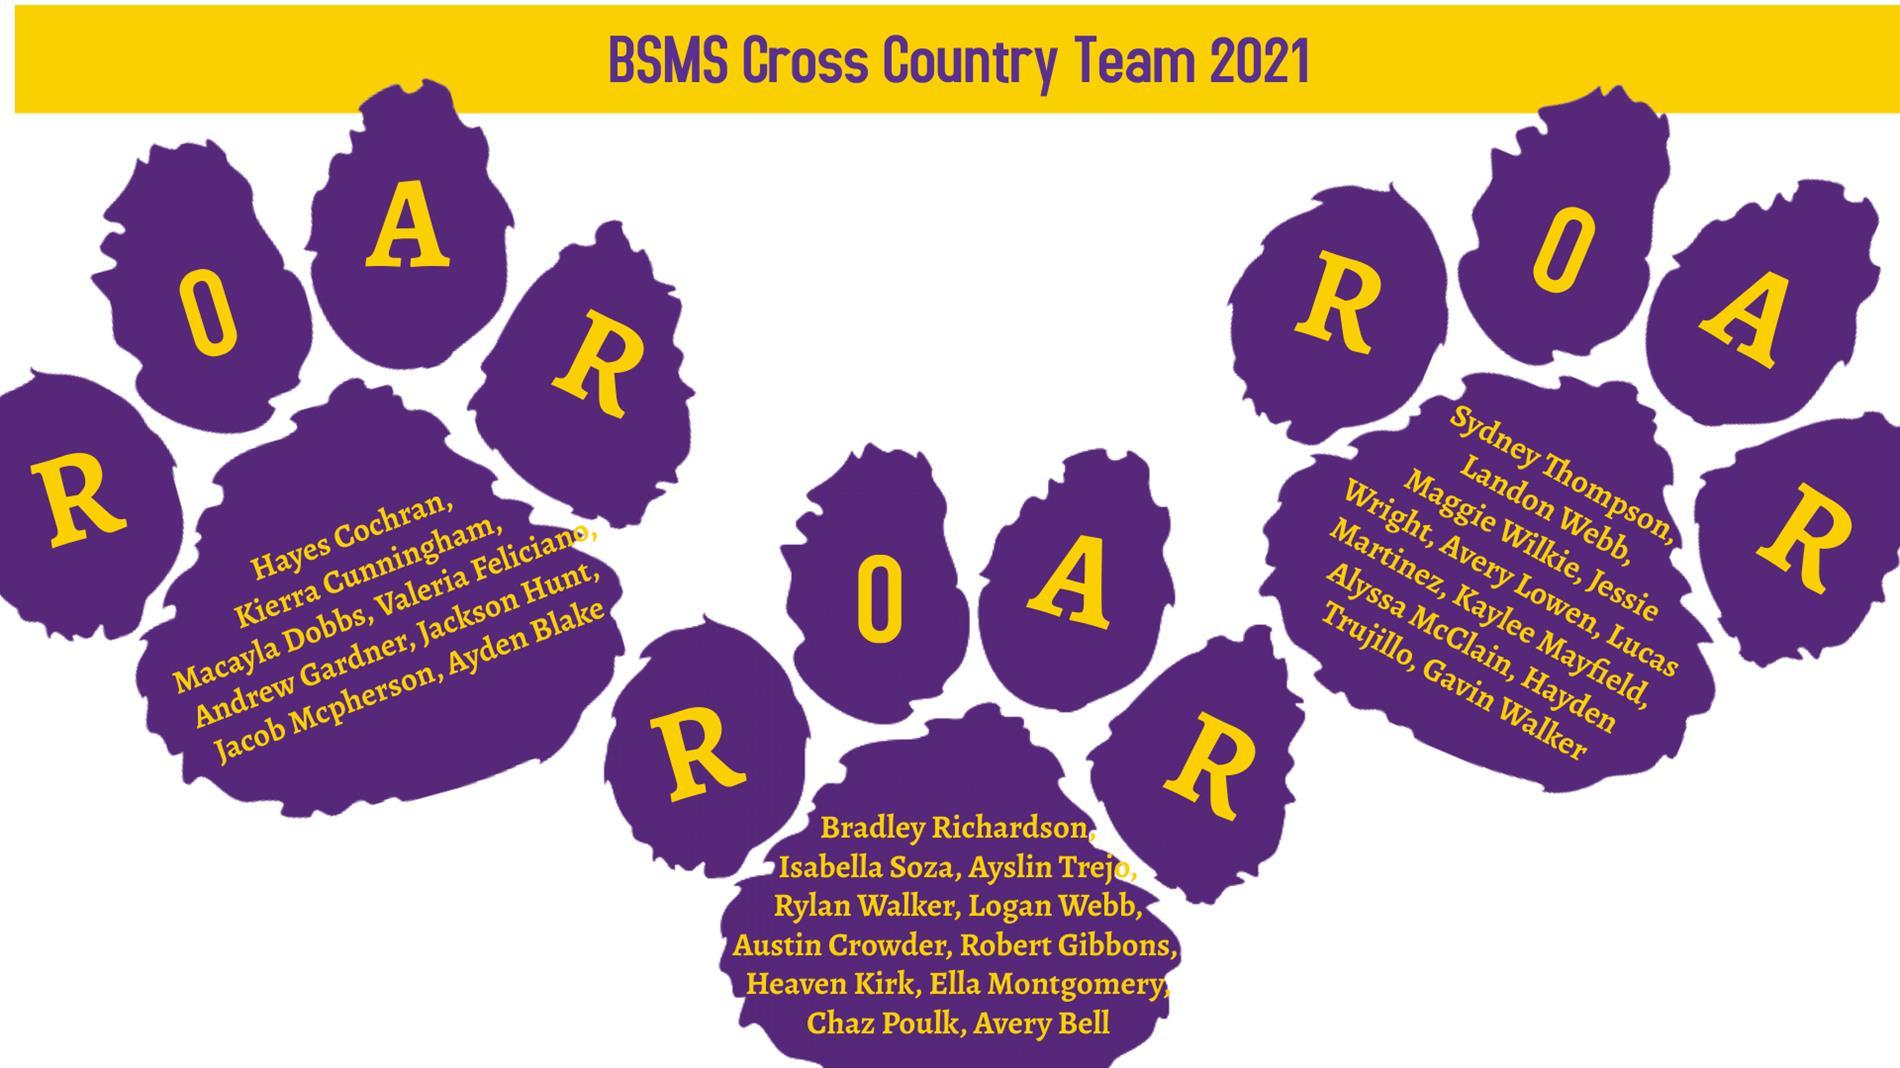 2021 BSMS Cross Country Team